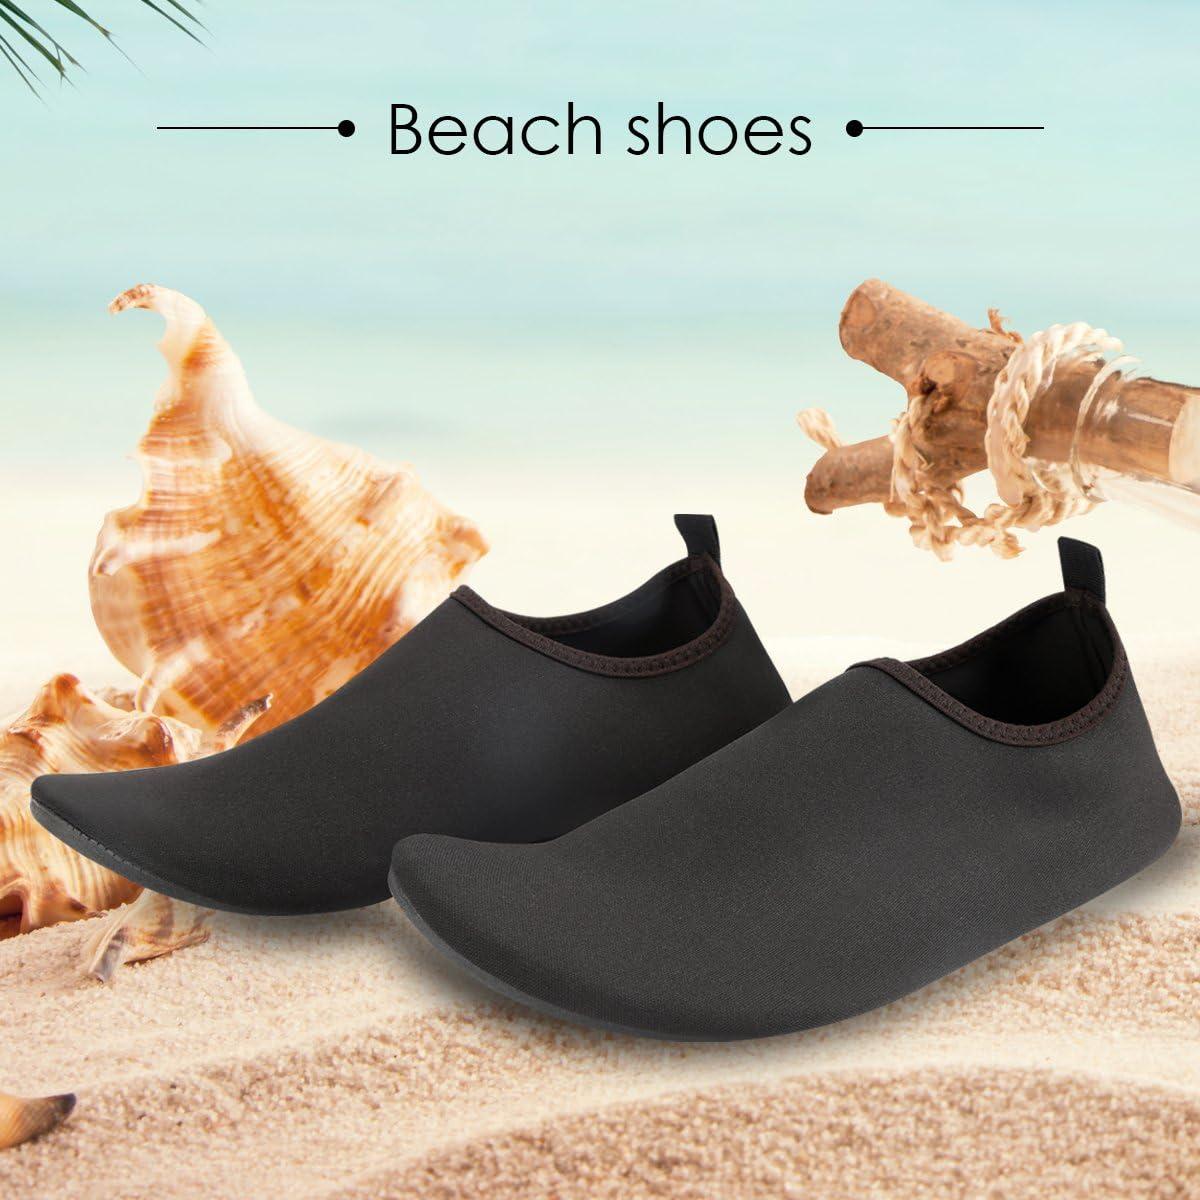 KUNSHOP Water Shoes Slip-on Aqua Beach Shoes Quick Dry Barefoot Sport Skin Sandals for Men Women Swim Summer Outdoor